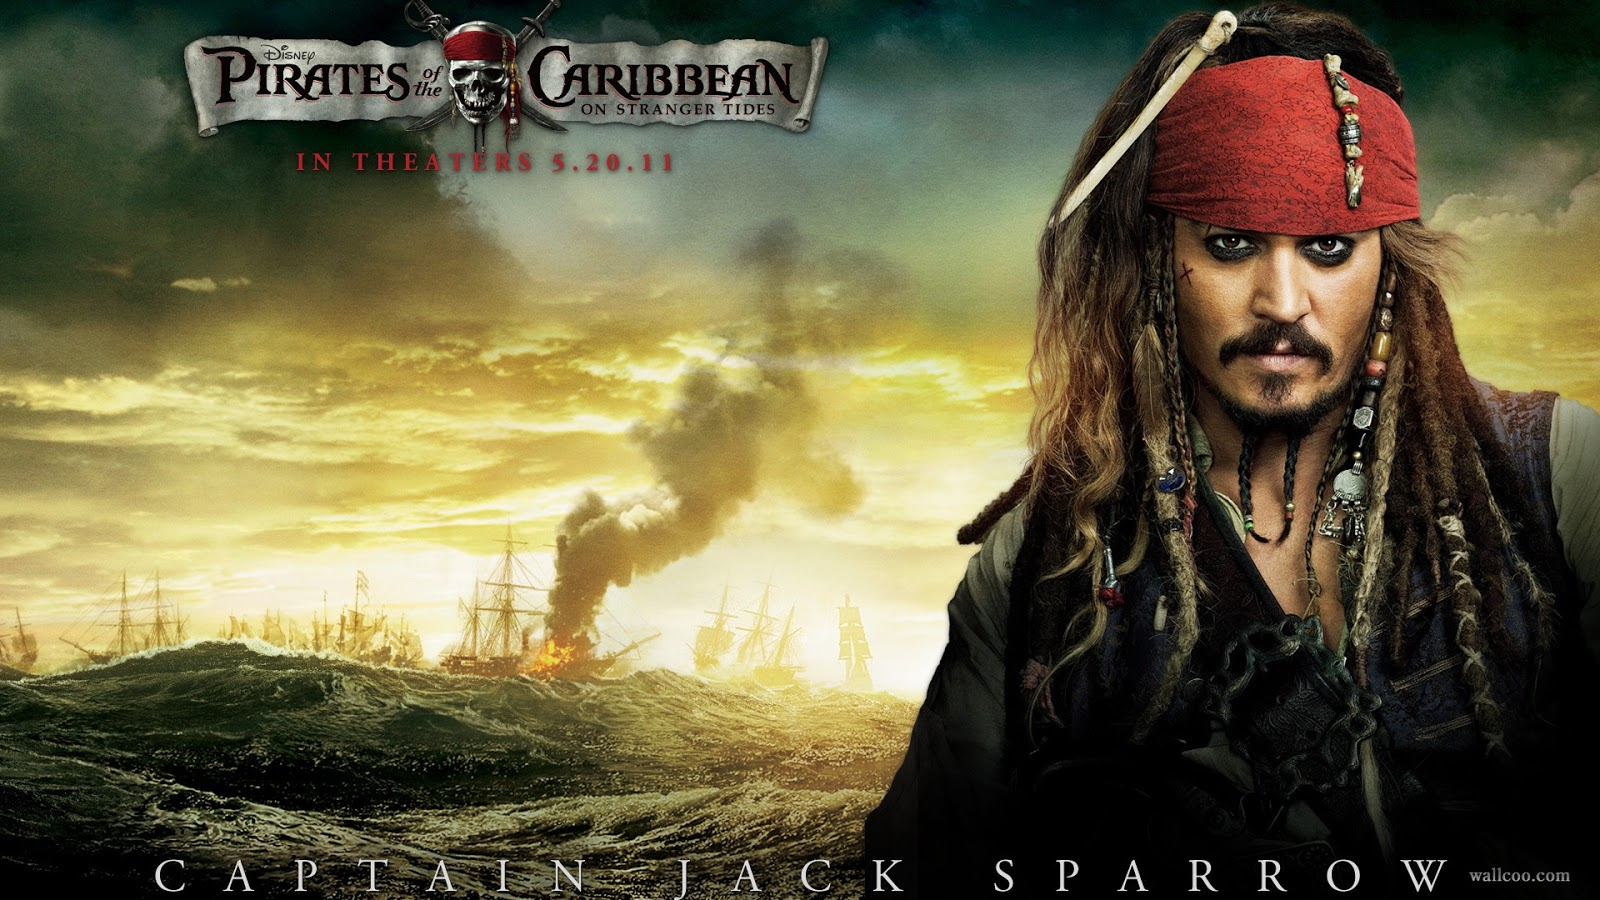 pirates of the caribbean on stranger tides torrent